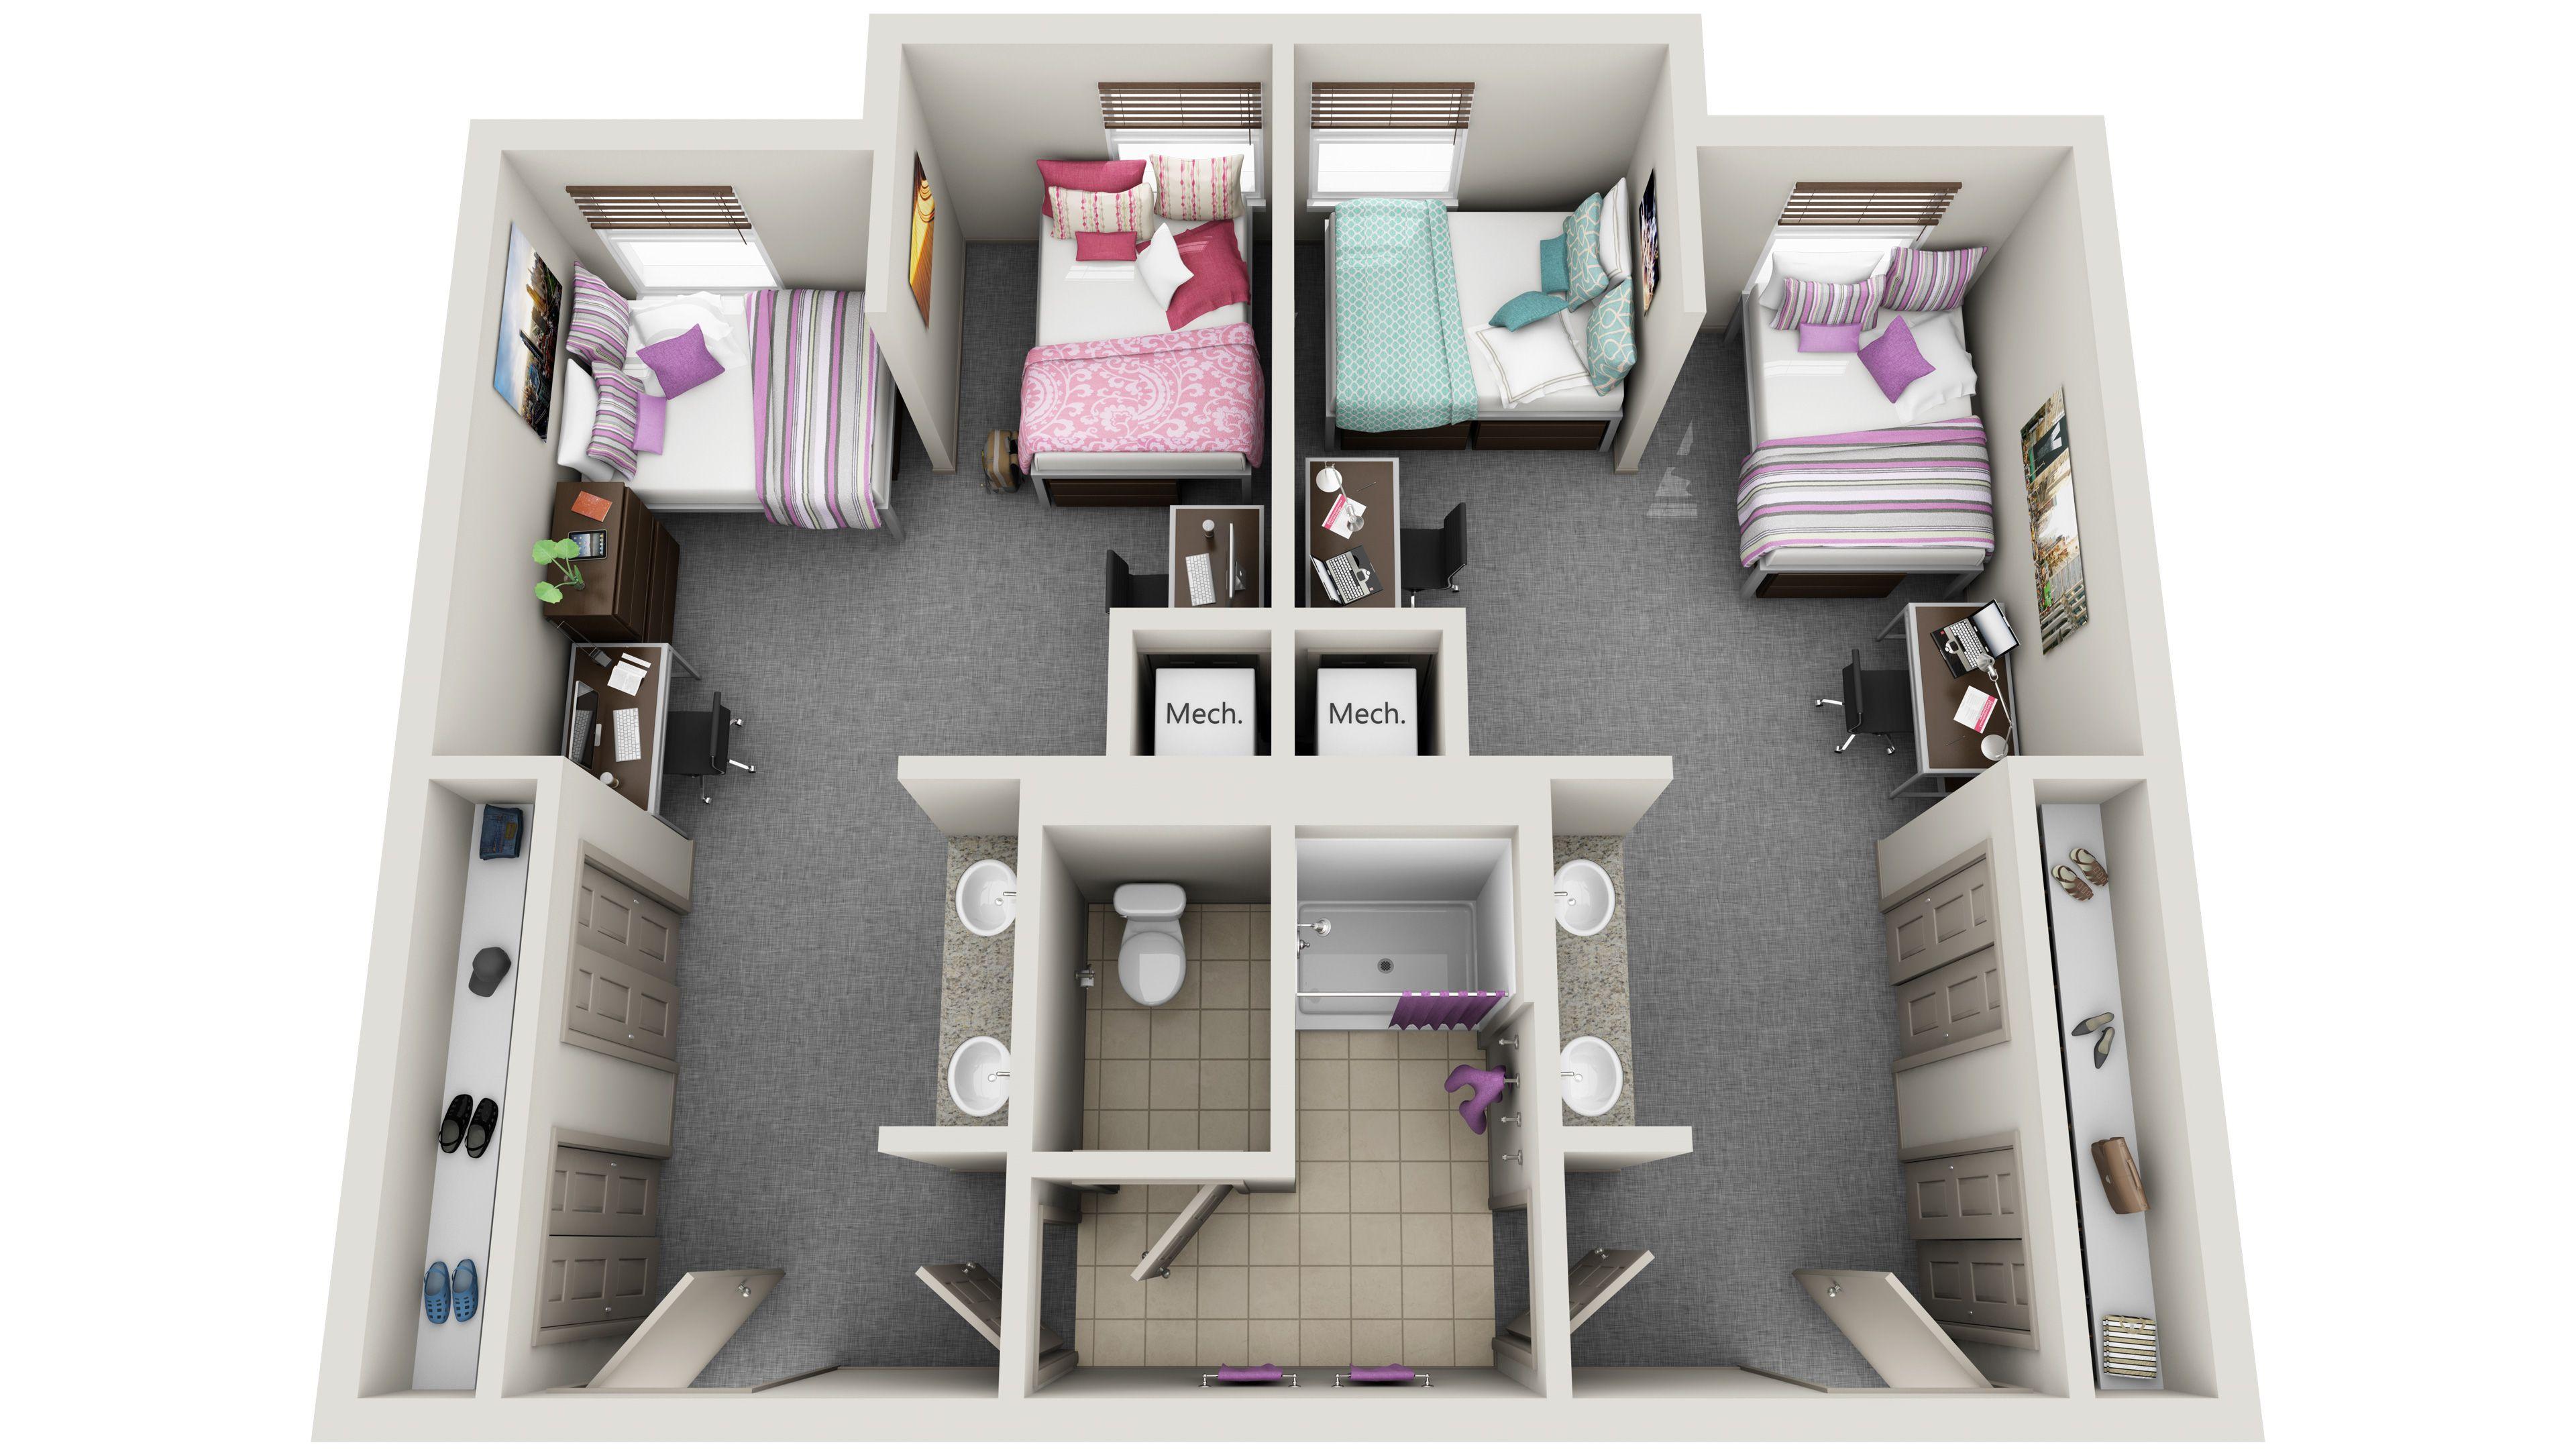 Standard 3d Floor Plans Dorm Room Layouts Dorm Layout Dorm Design